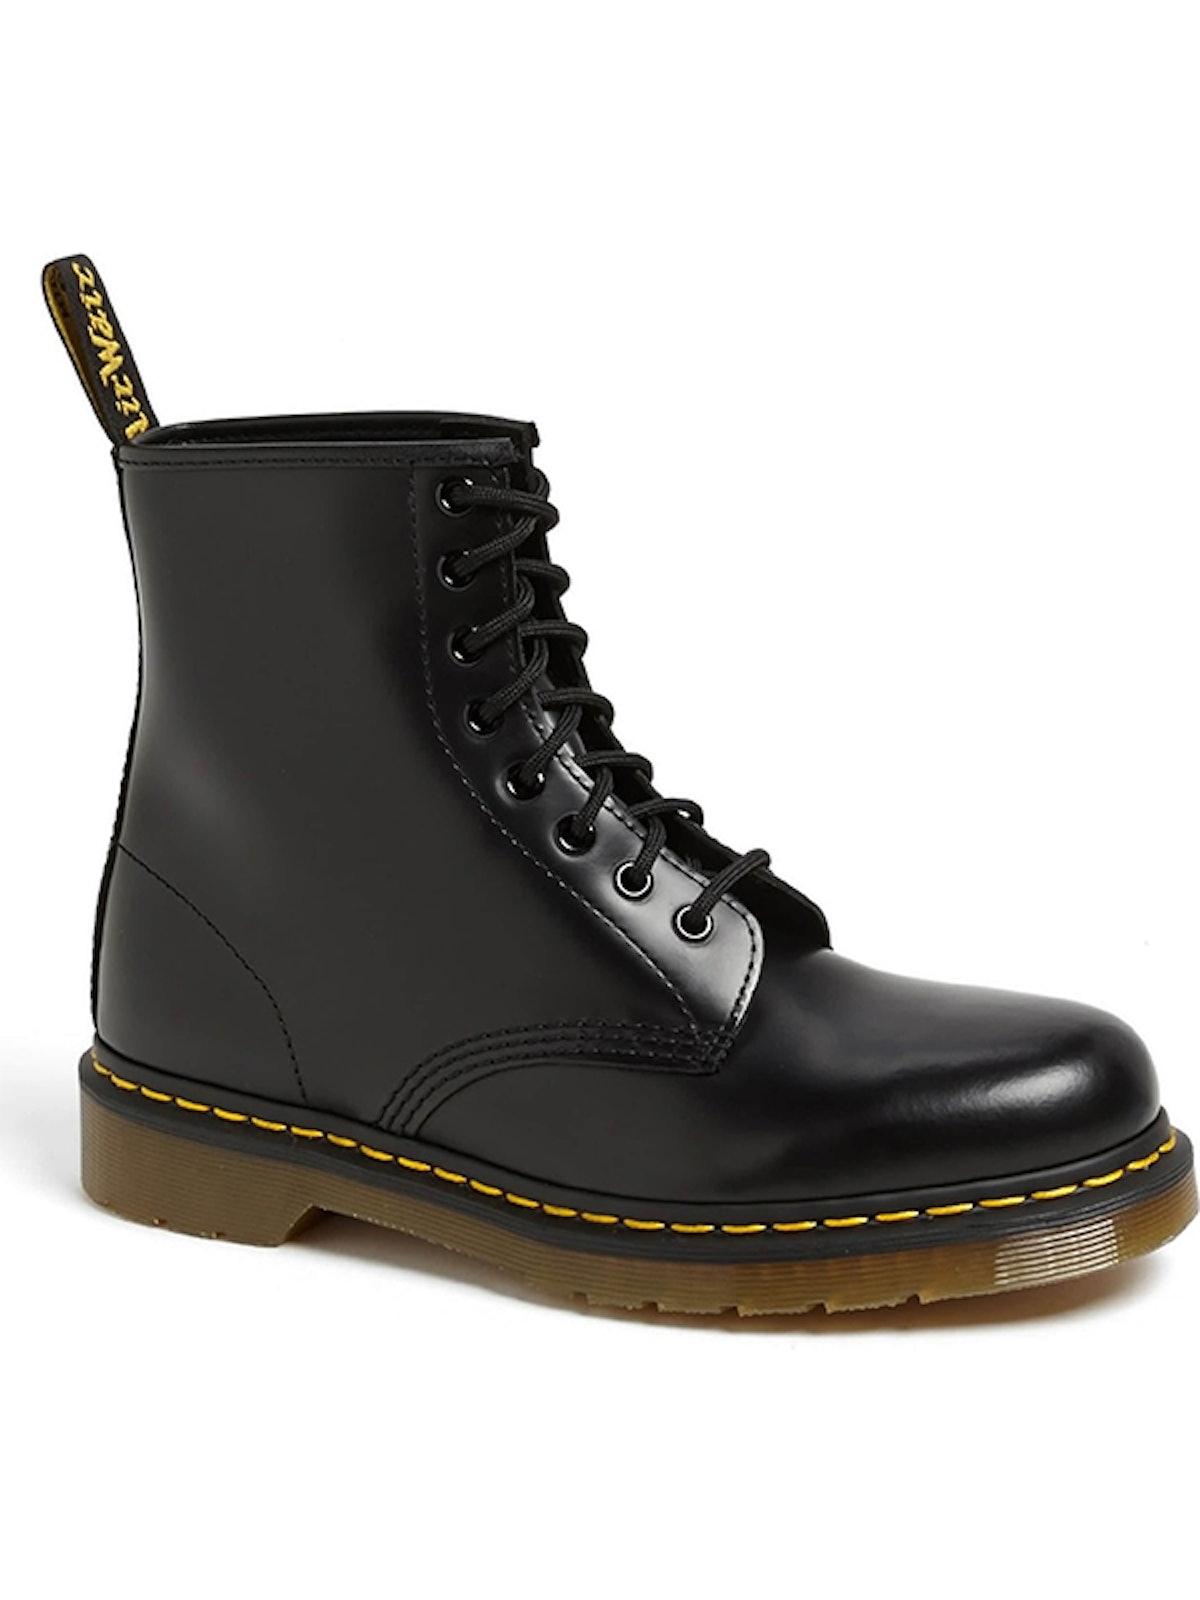 '1460' Boot